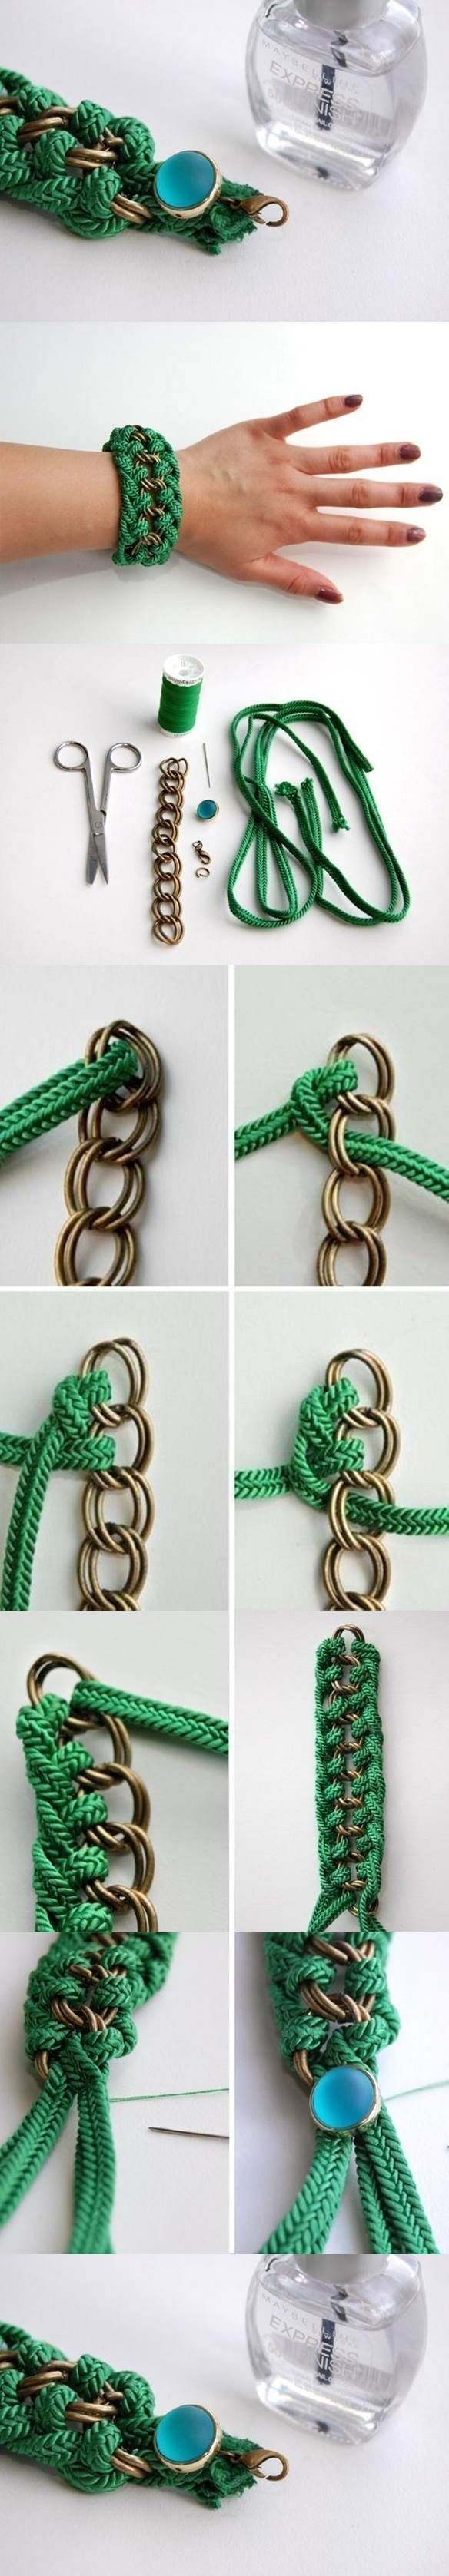 DIY Beautiful Green Braided Bracelet | iCreativeIdeas.com Like Us on Facebook ==> https://www.facebook.com/icreativeideas